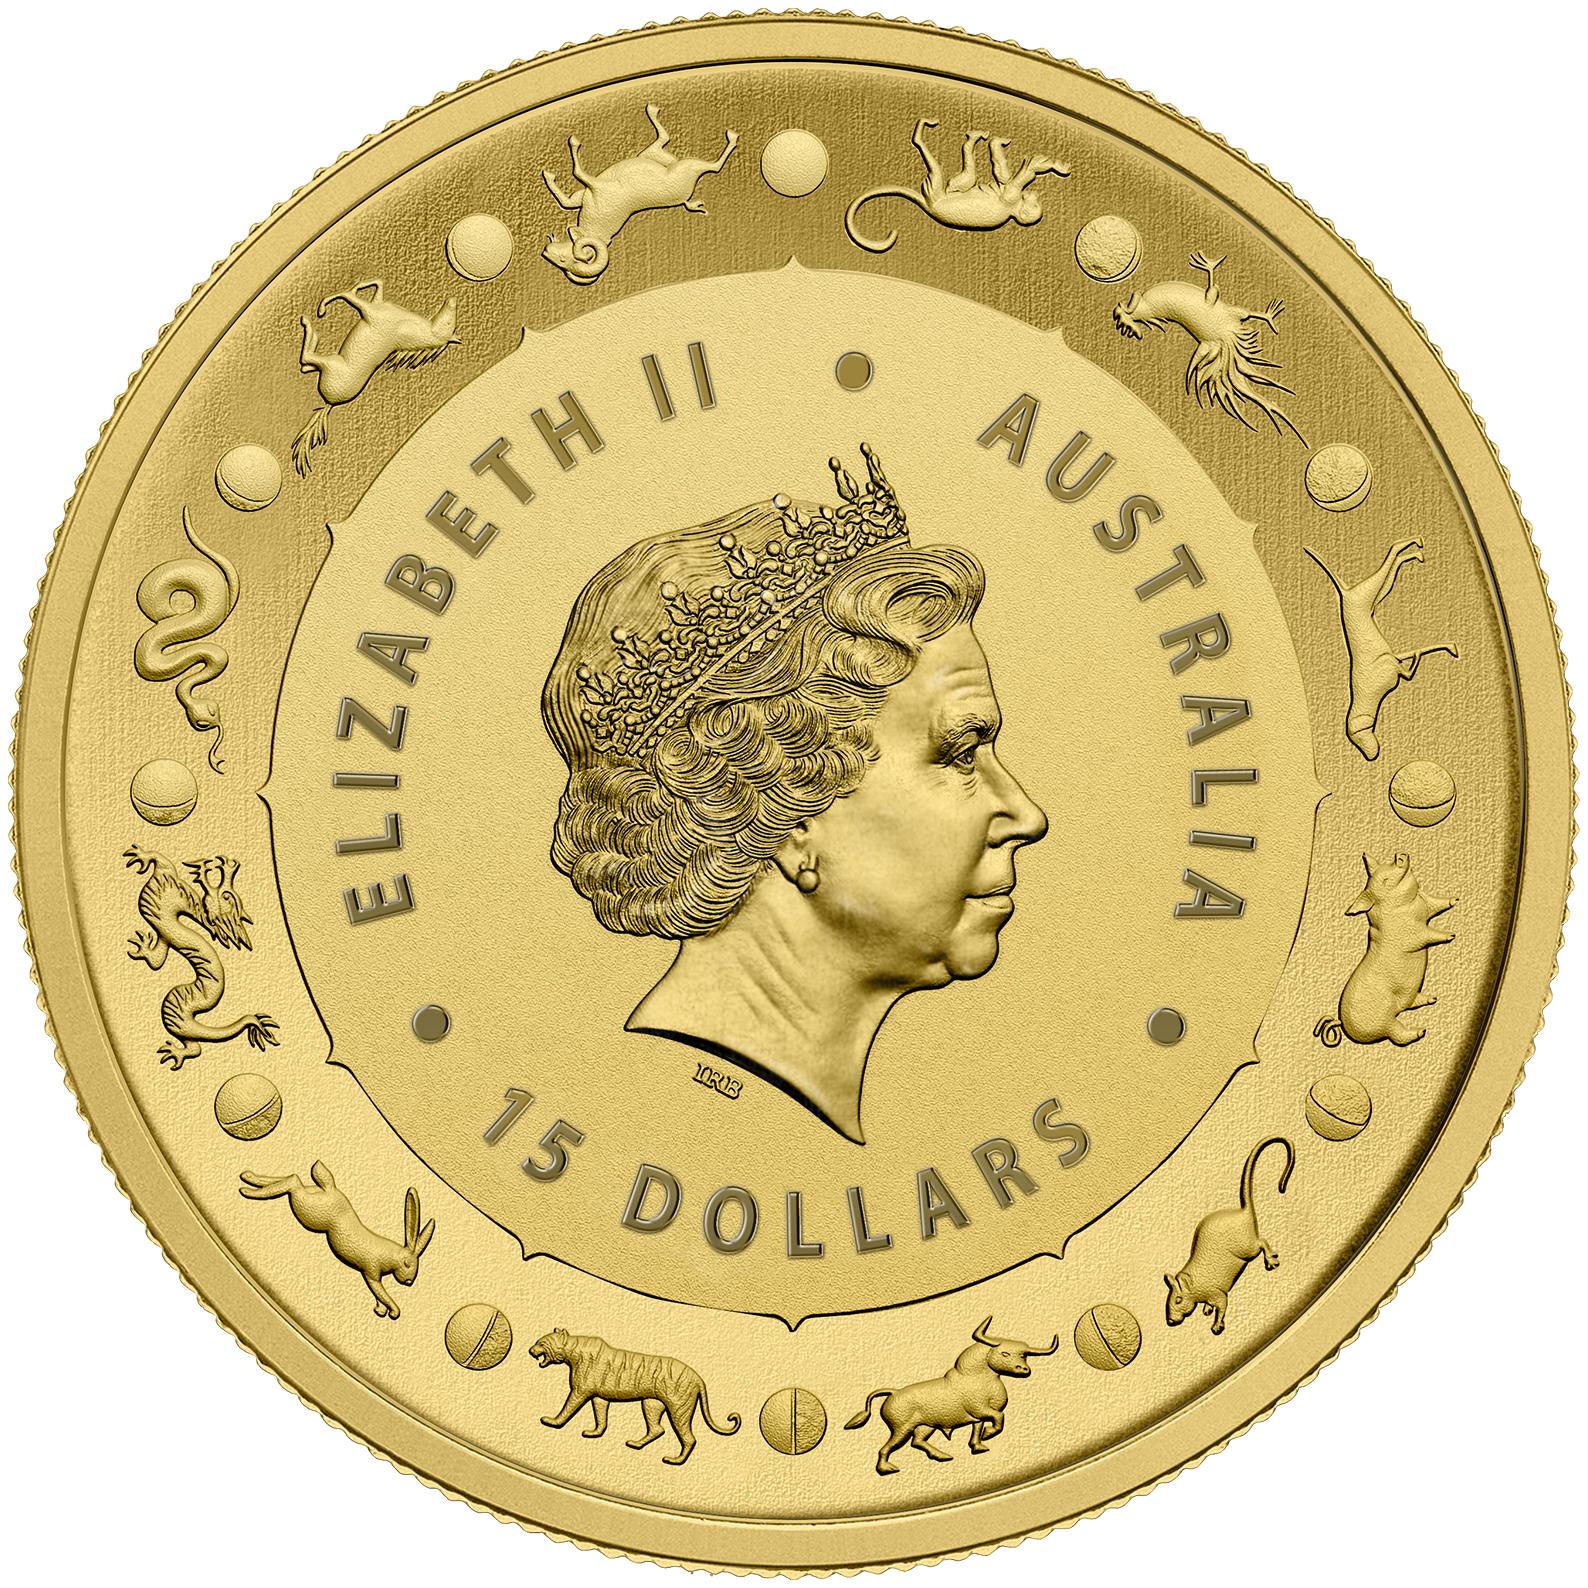 1/10 oz Gold Coin - Lunar Pig BU 2019